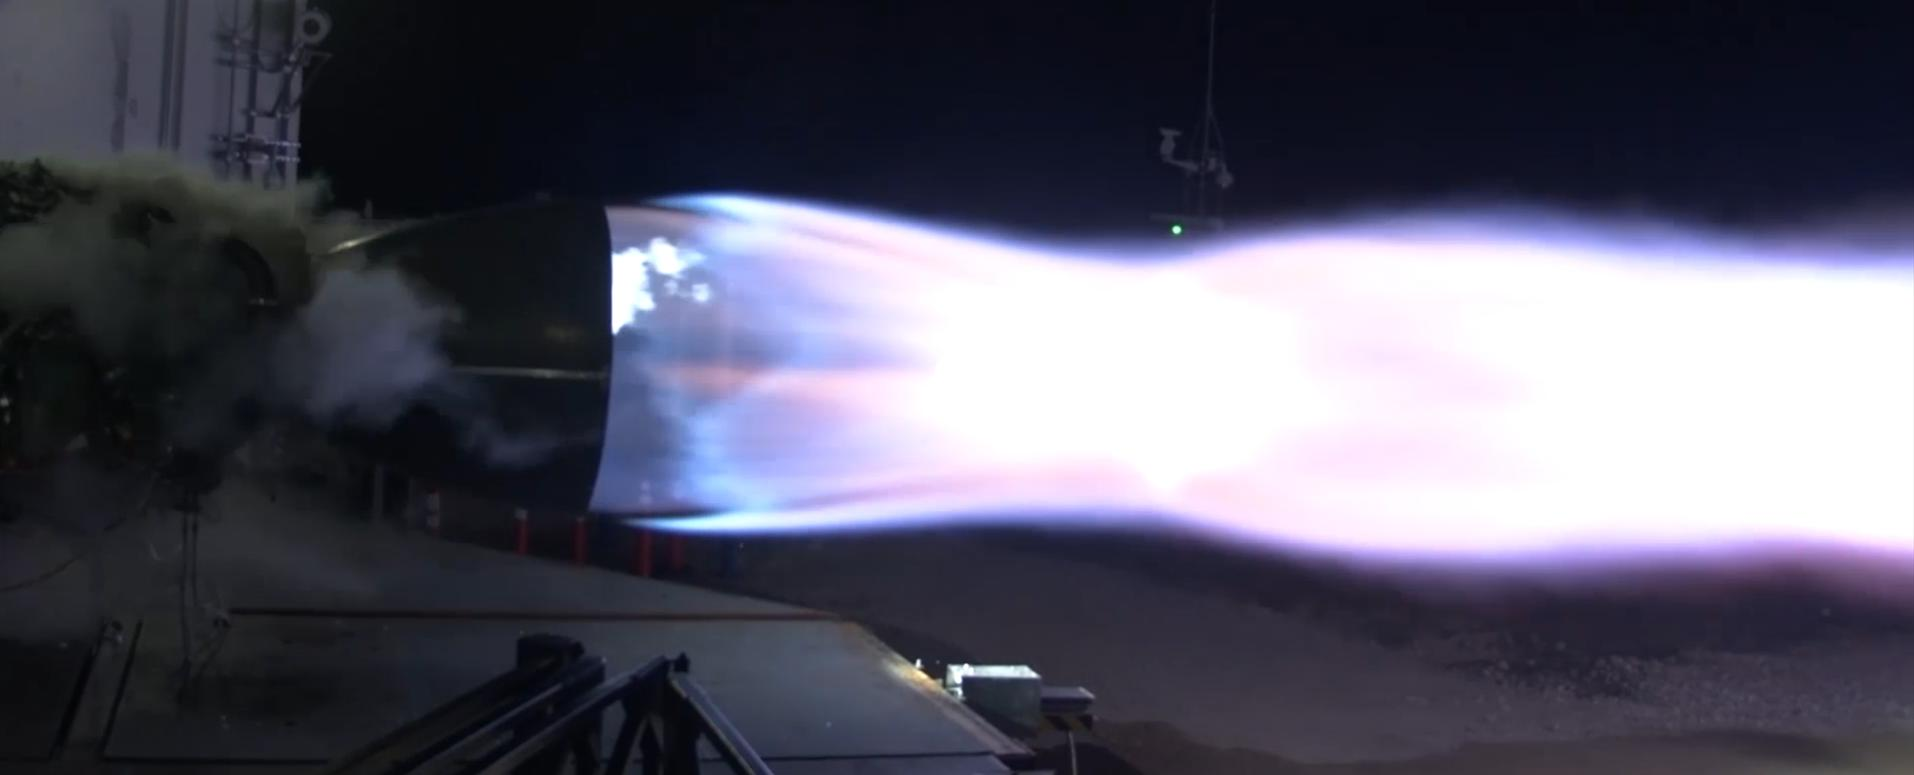 Raptor static fire 2019 (SpaceX) 1 crop